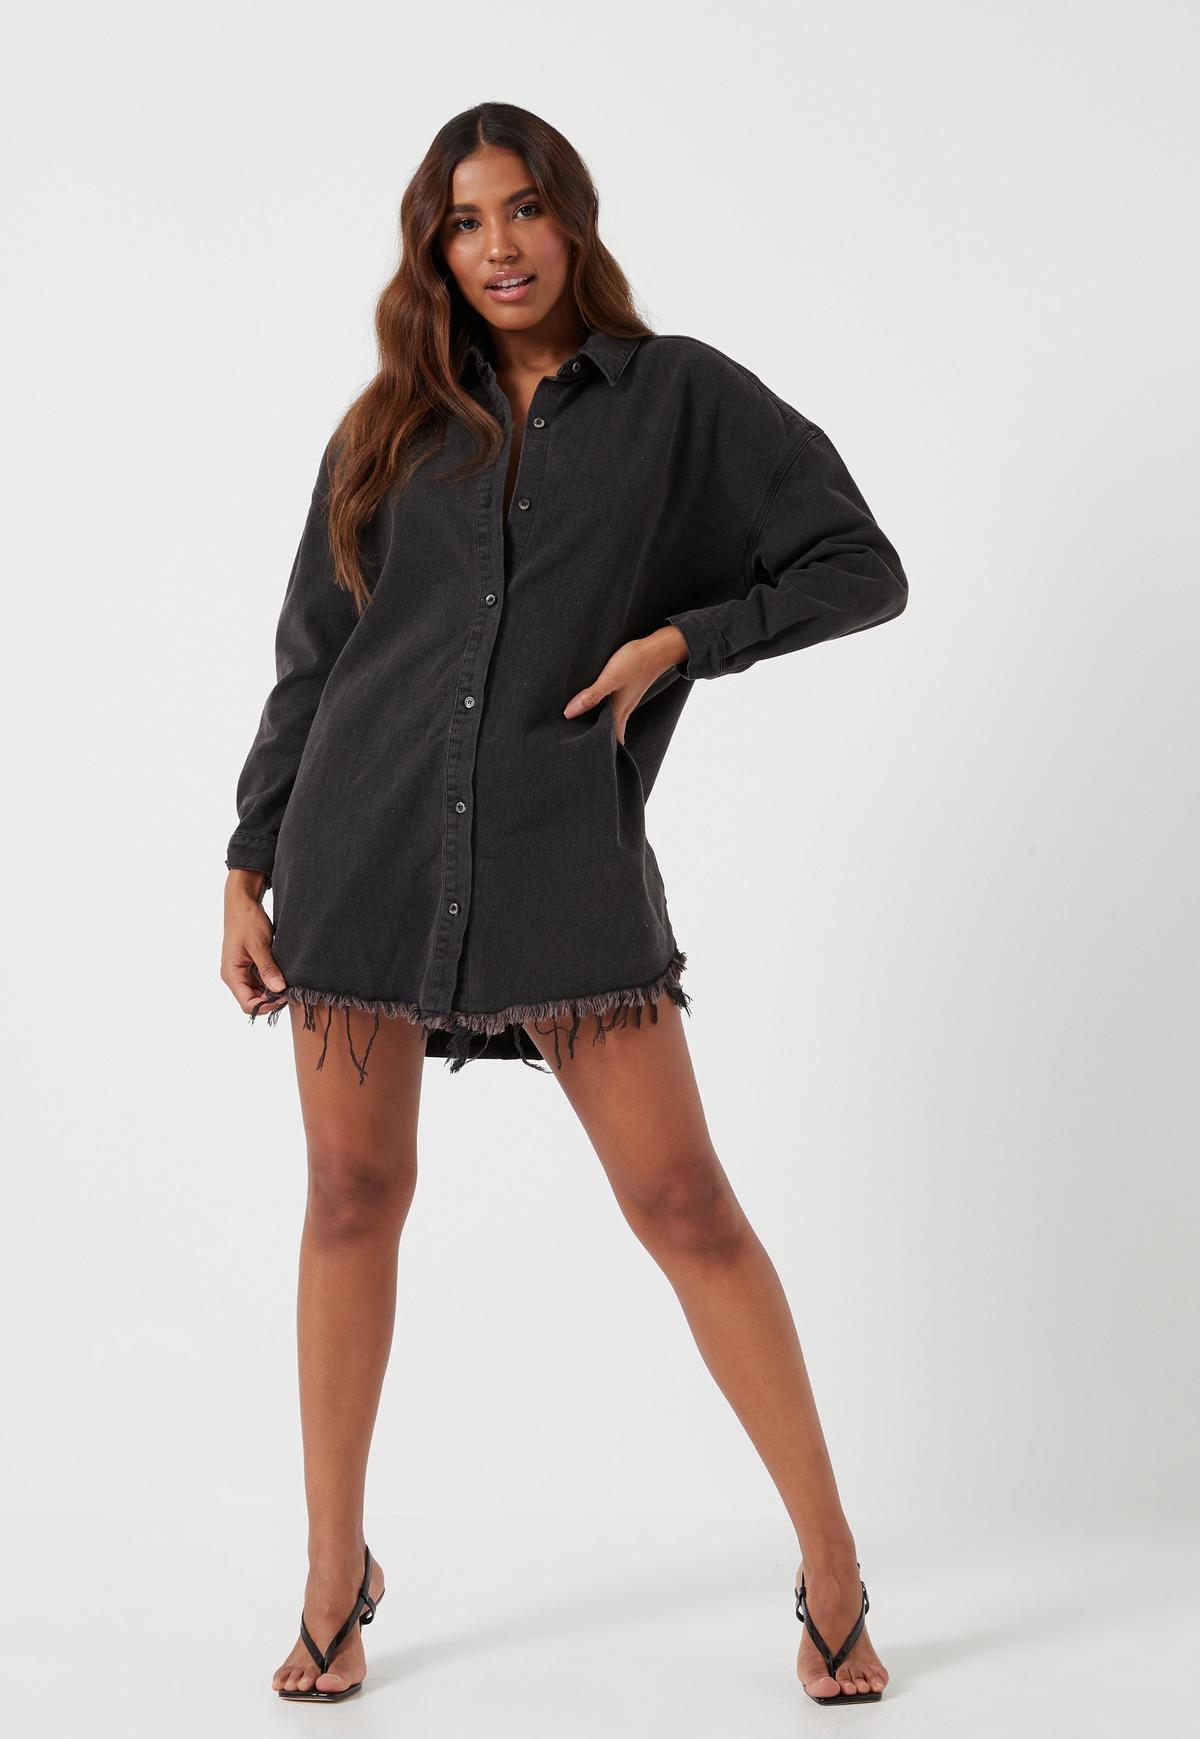 Black Oversized Denim Shirt Dress